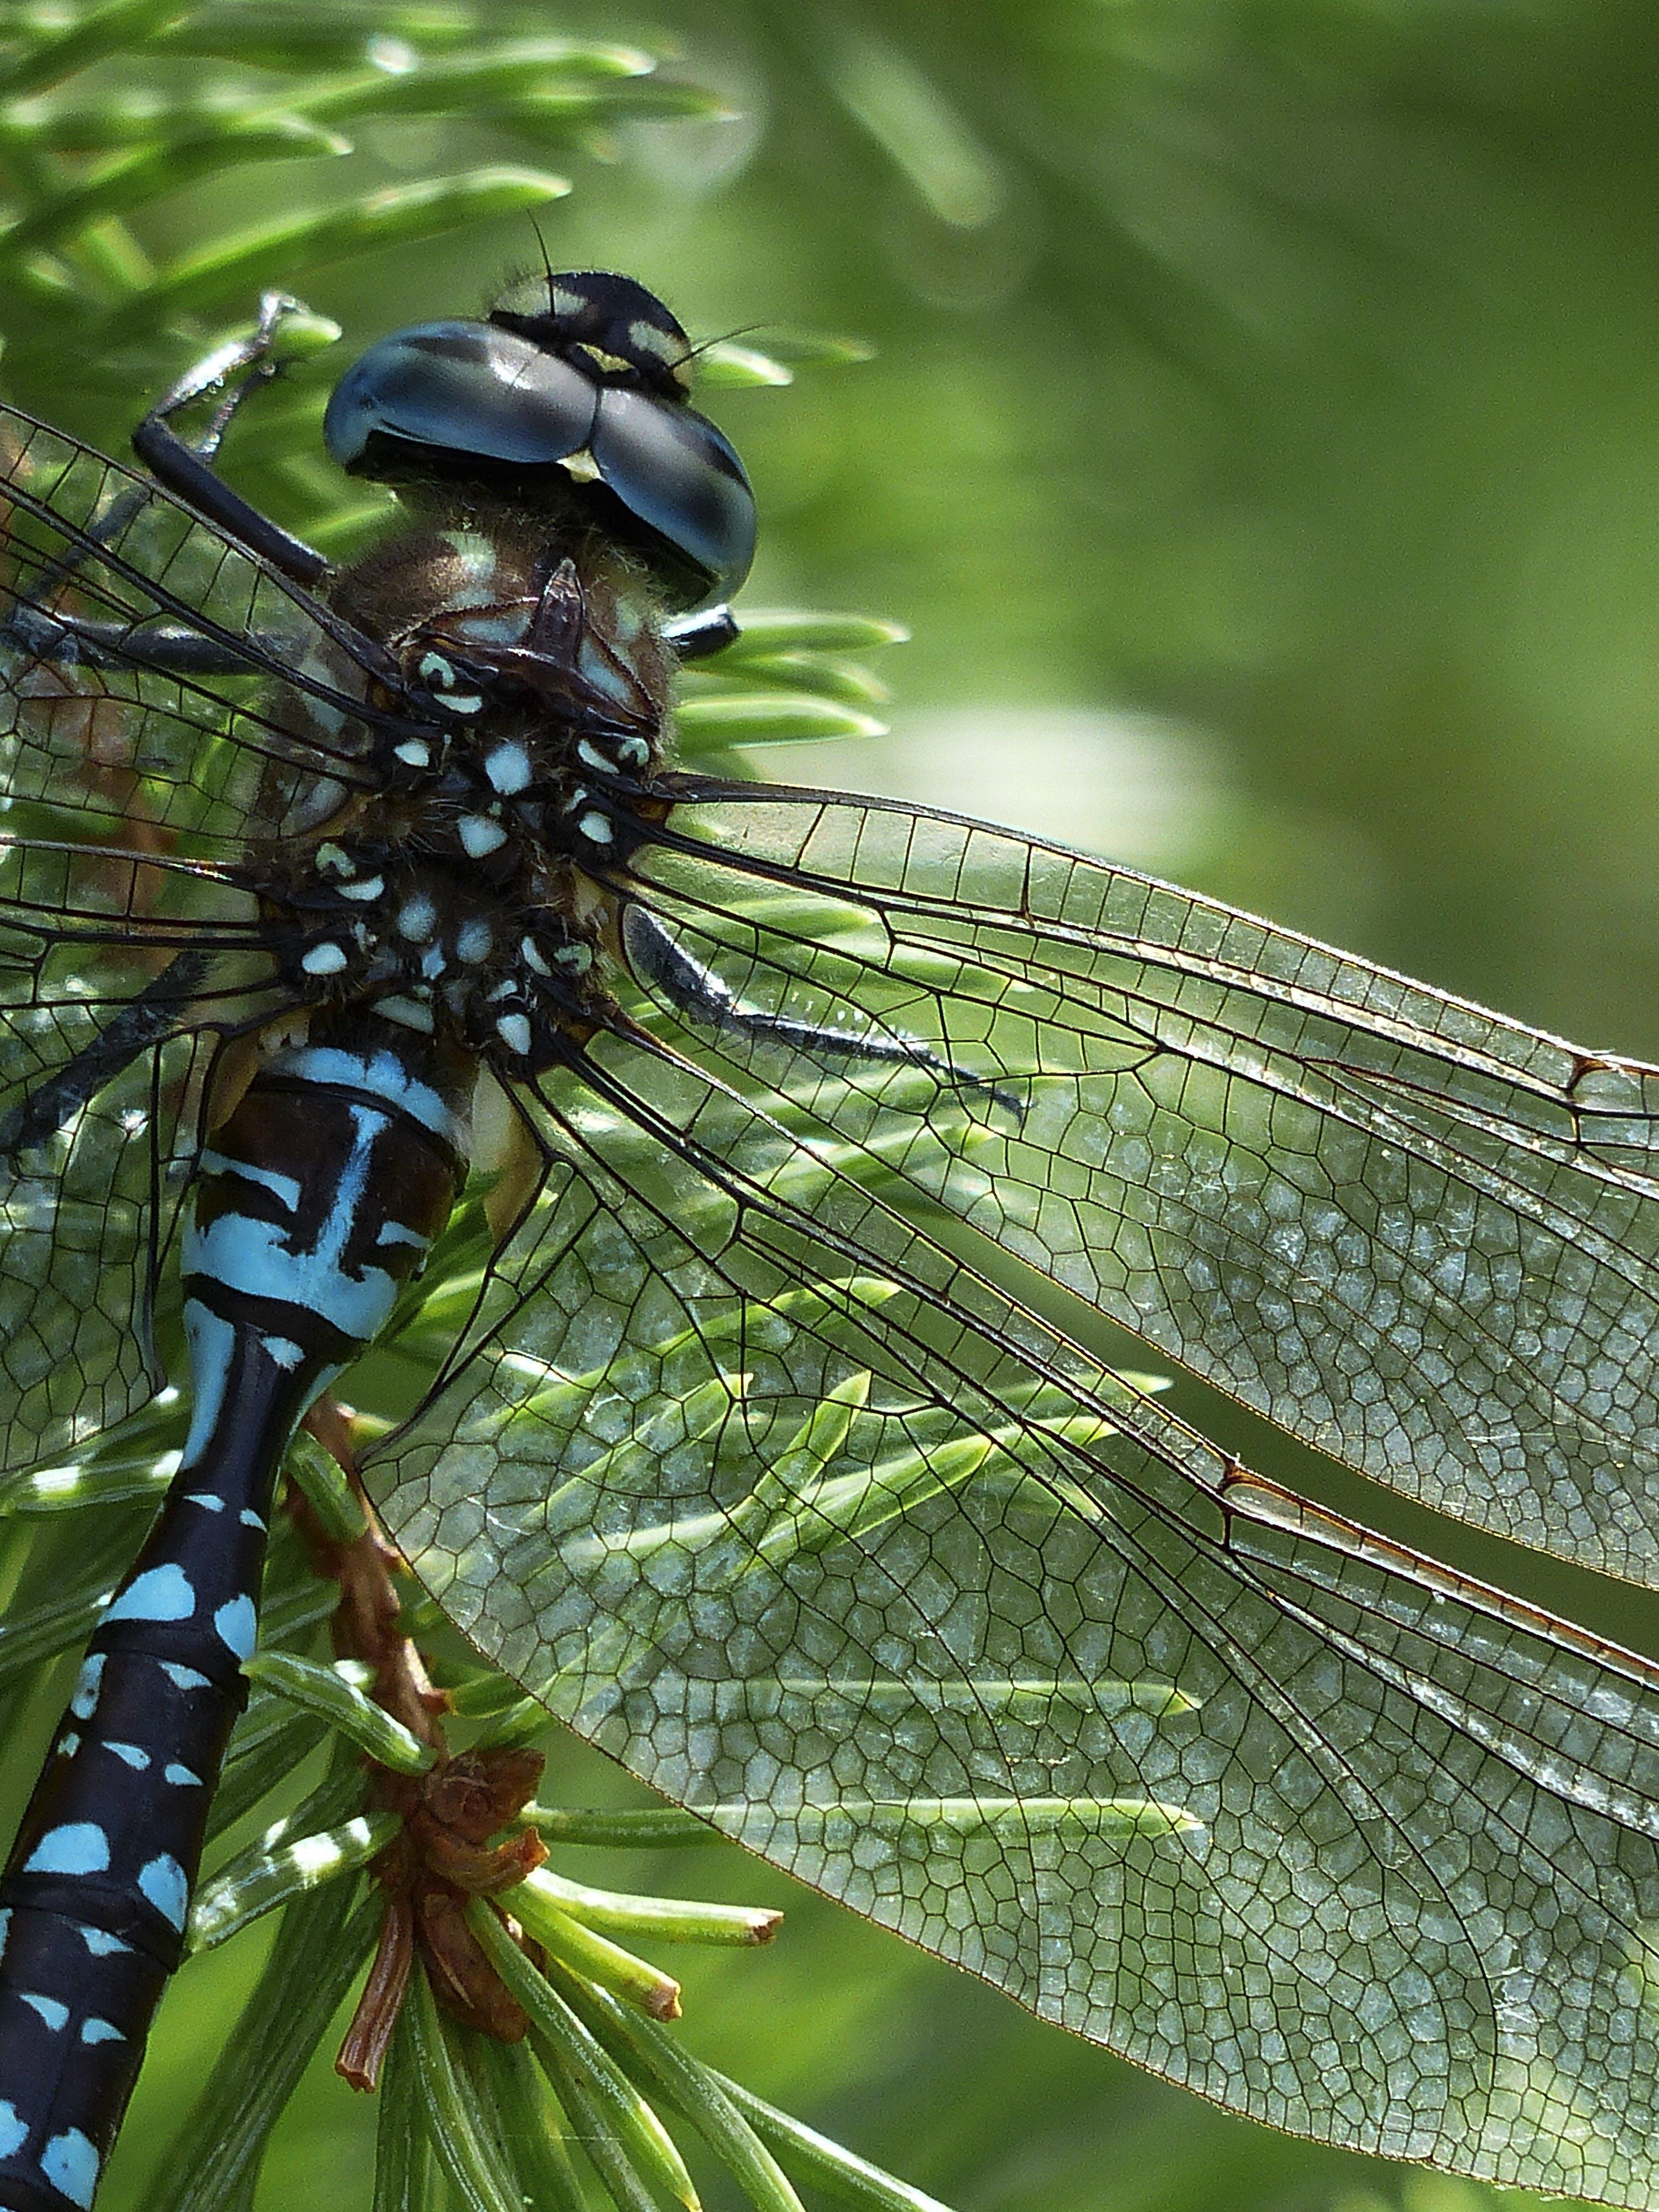 Blue Black Dragonfly